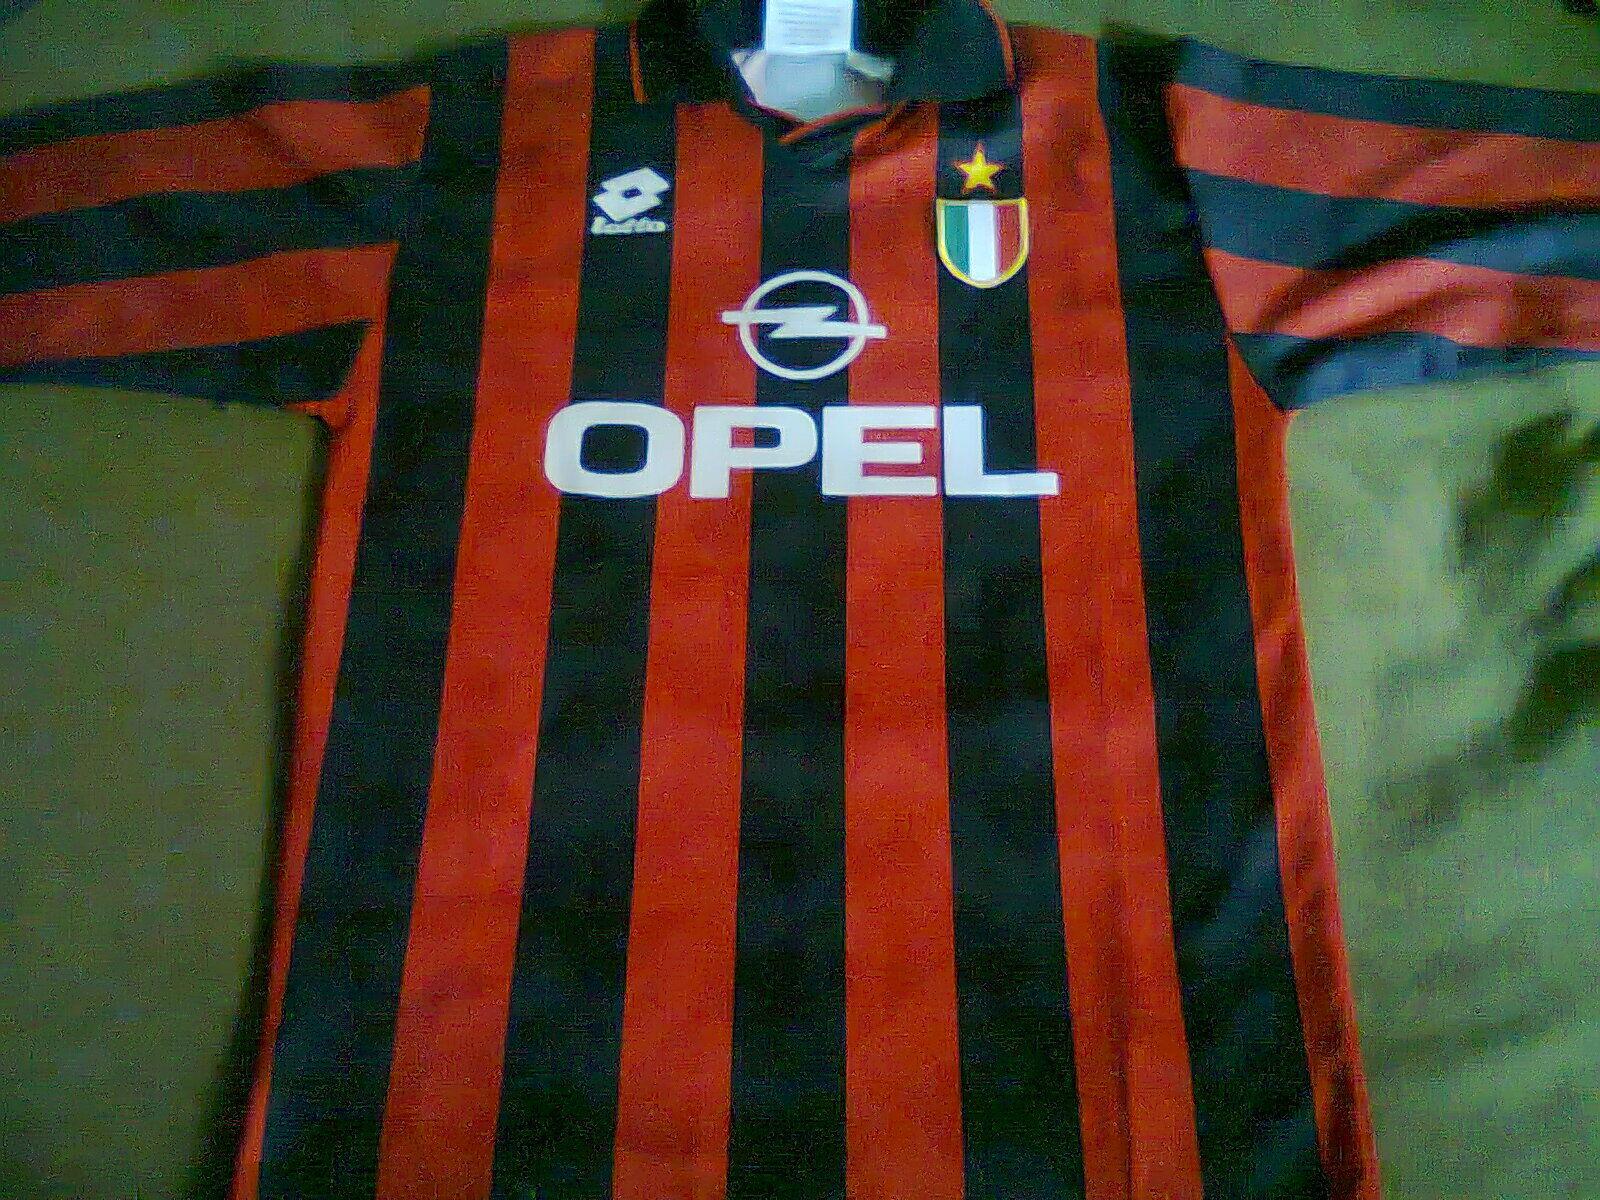 Maglia AC Milan home shirt camiseta trikot maillot tg. M chest 52 cm. VINTAGE